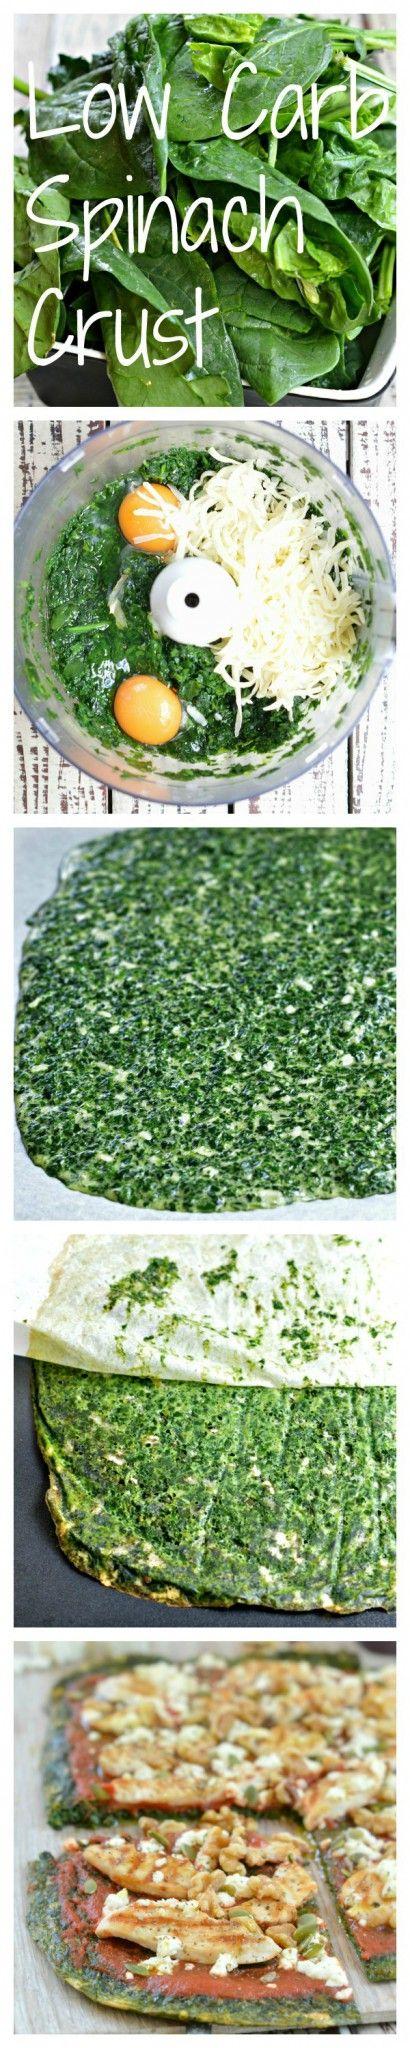 14 oz (400 g) fresh spinach leaves 1/2 cup grated edam cheese 2 eggs Salt, Pepper 1 tablespoon dried oregano